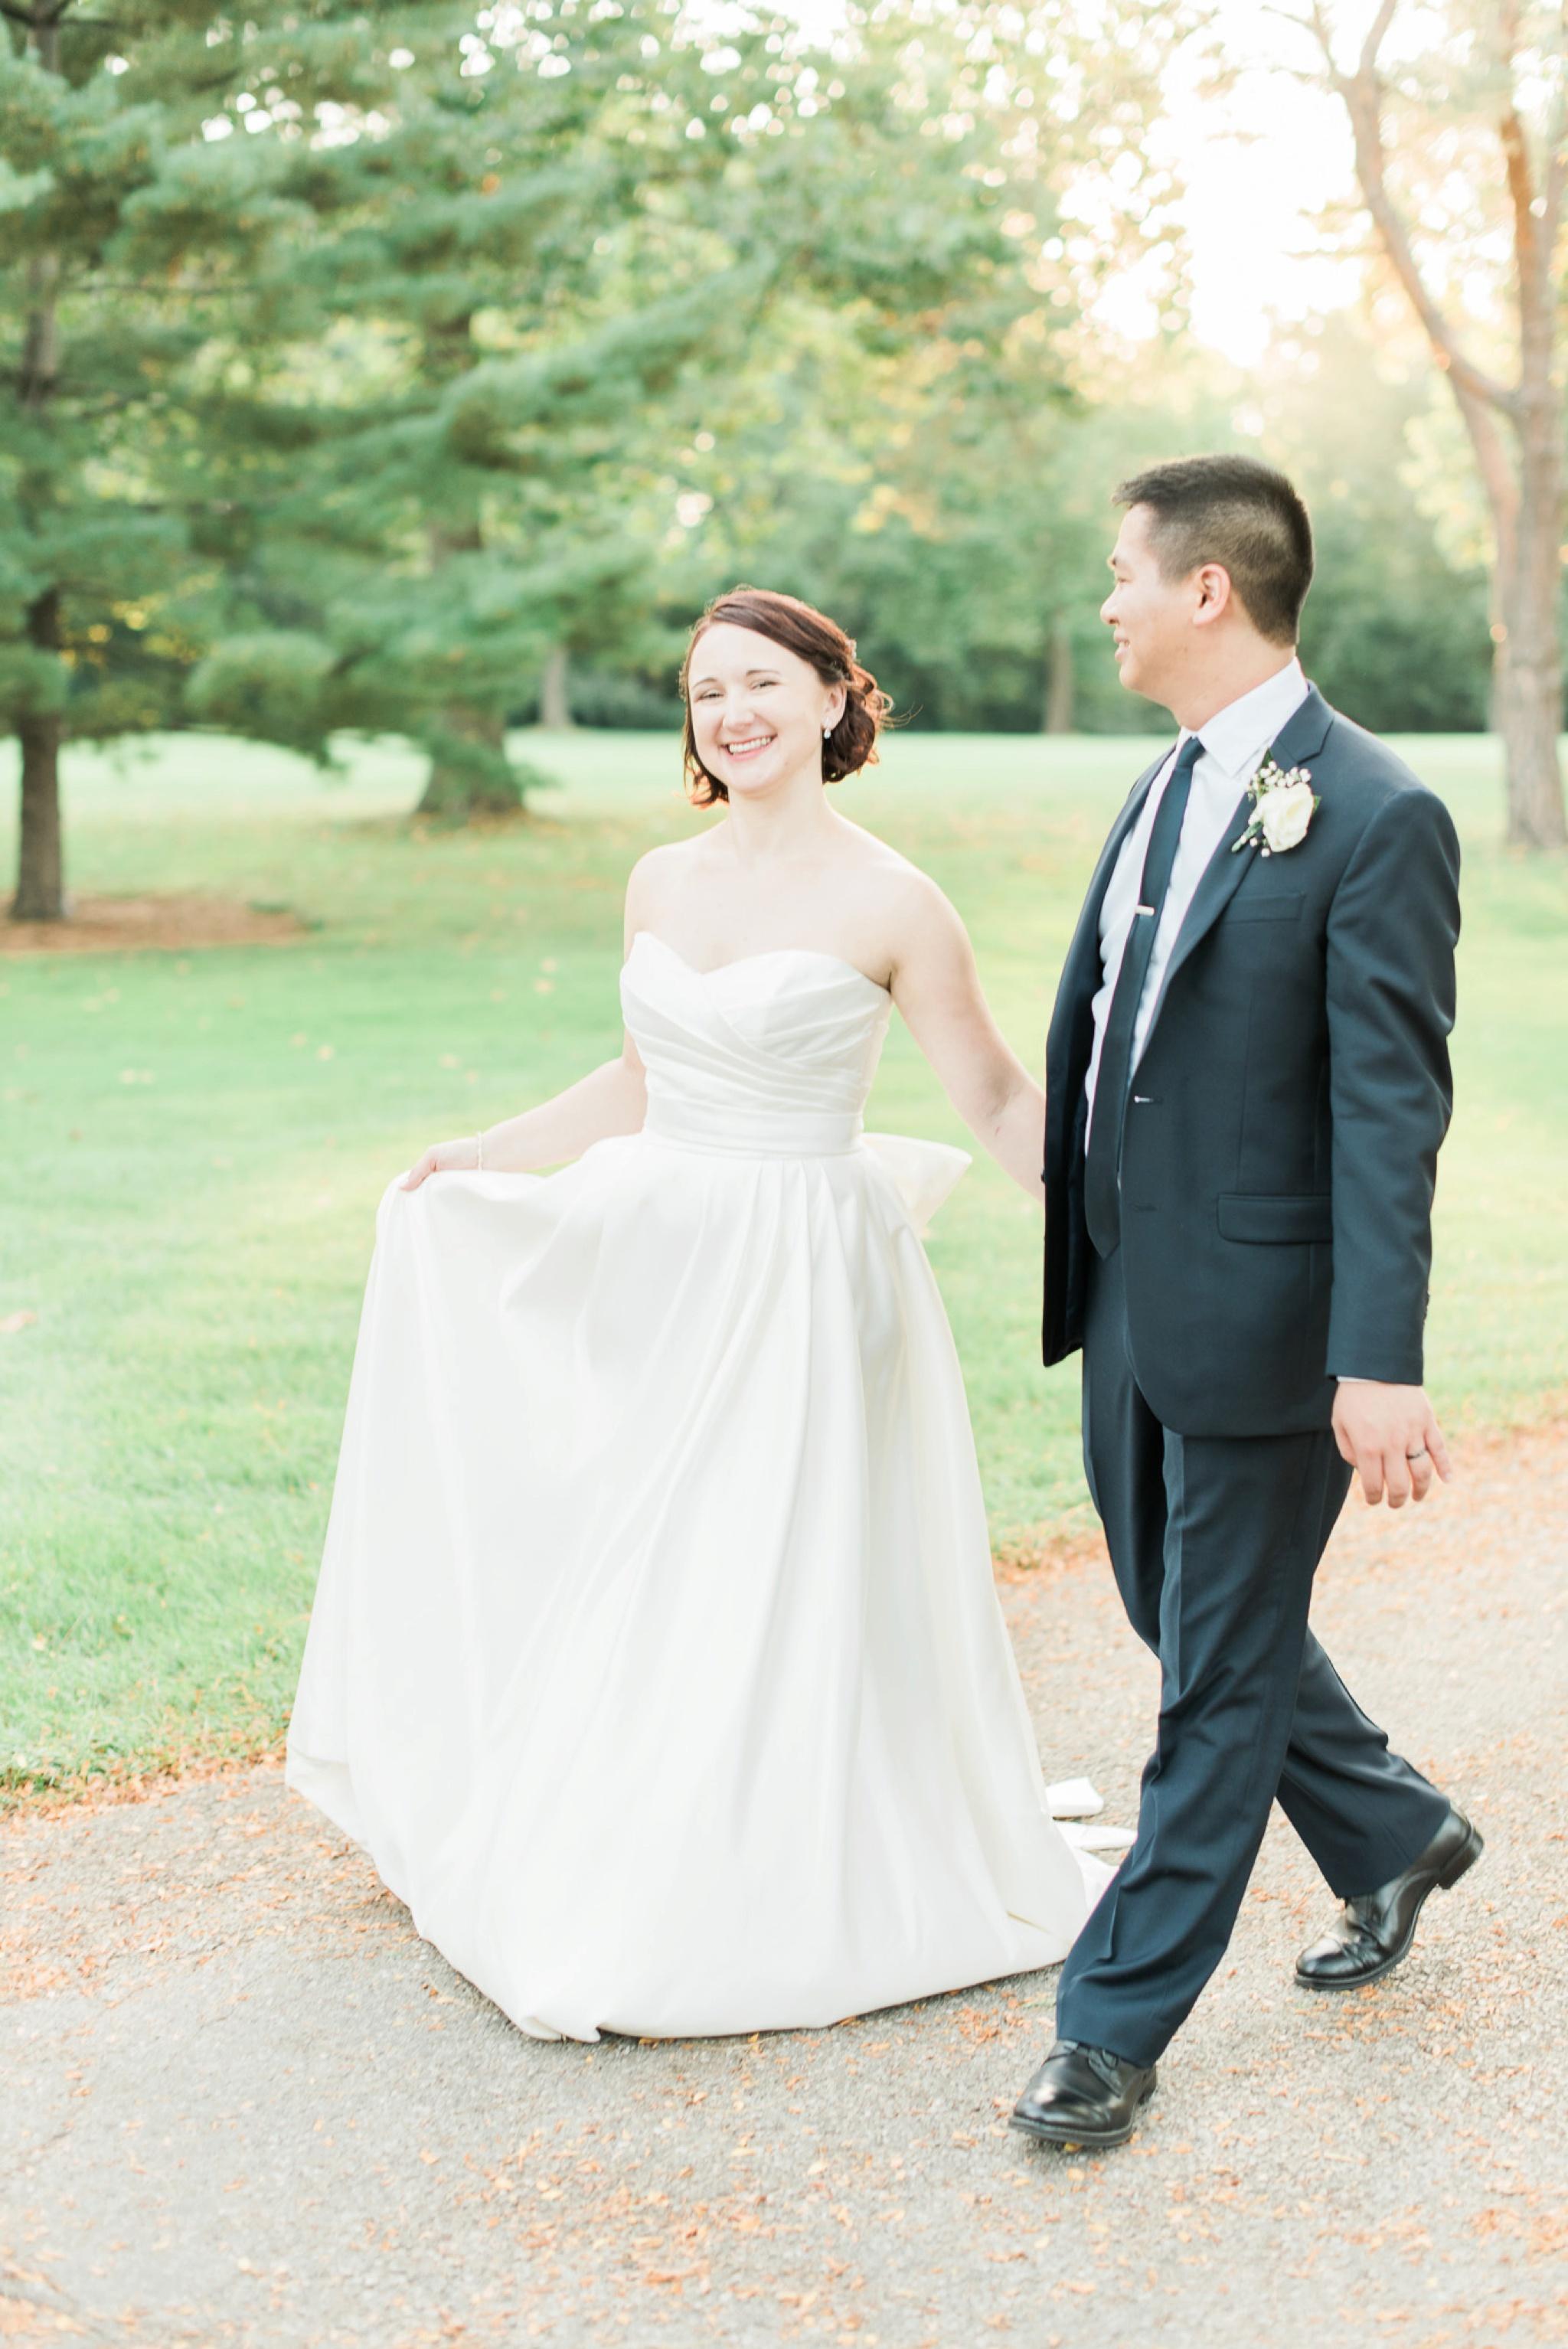 brookside-golf-country-club-wedding-columbus-ohio-132.jpg